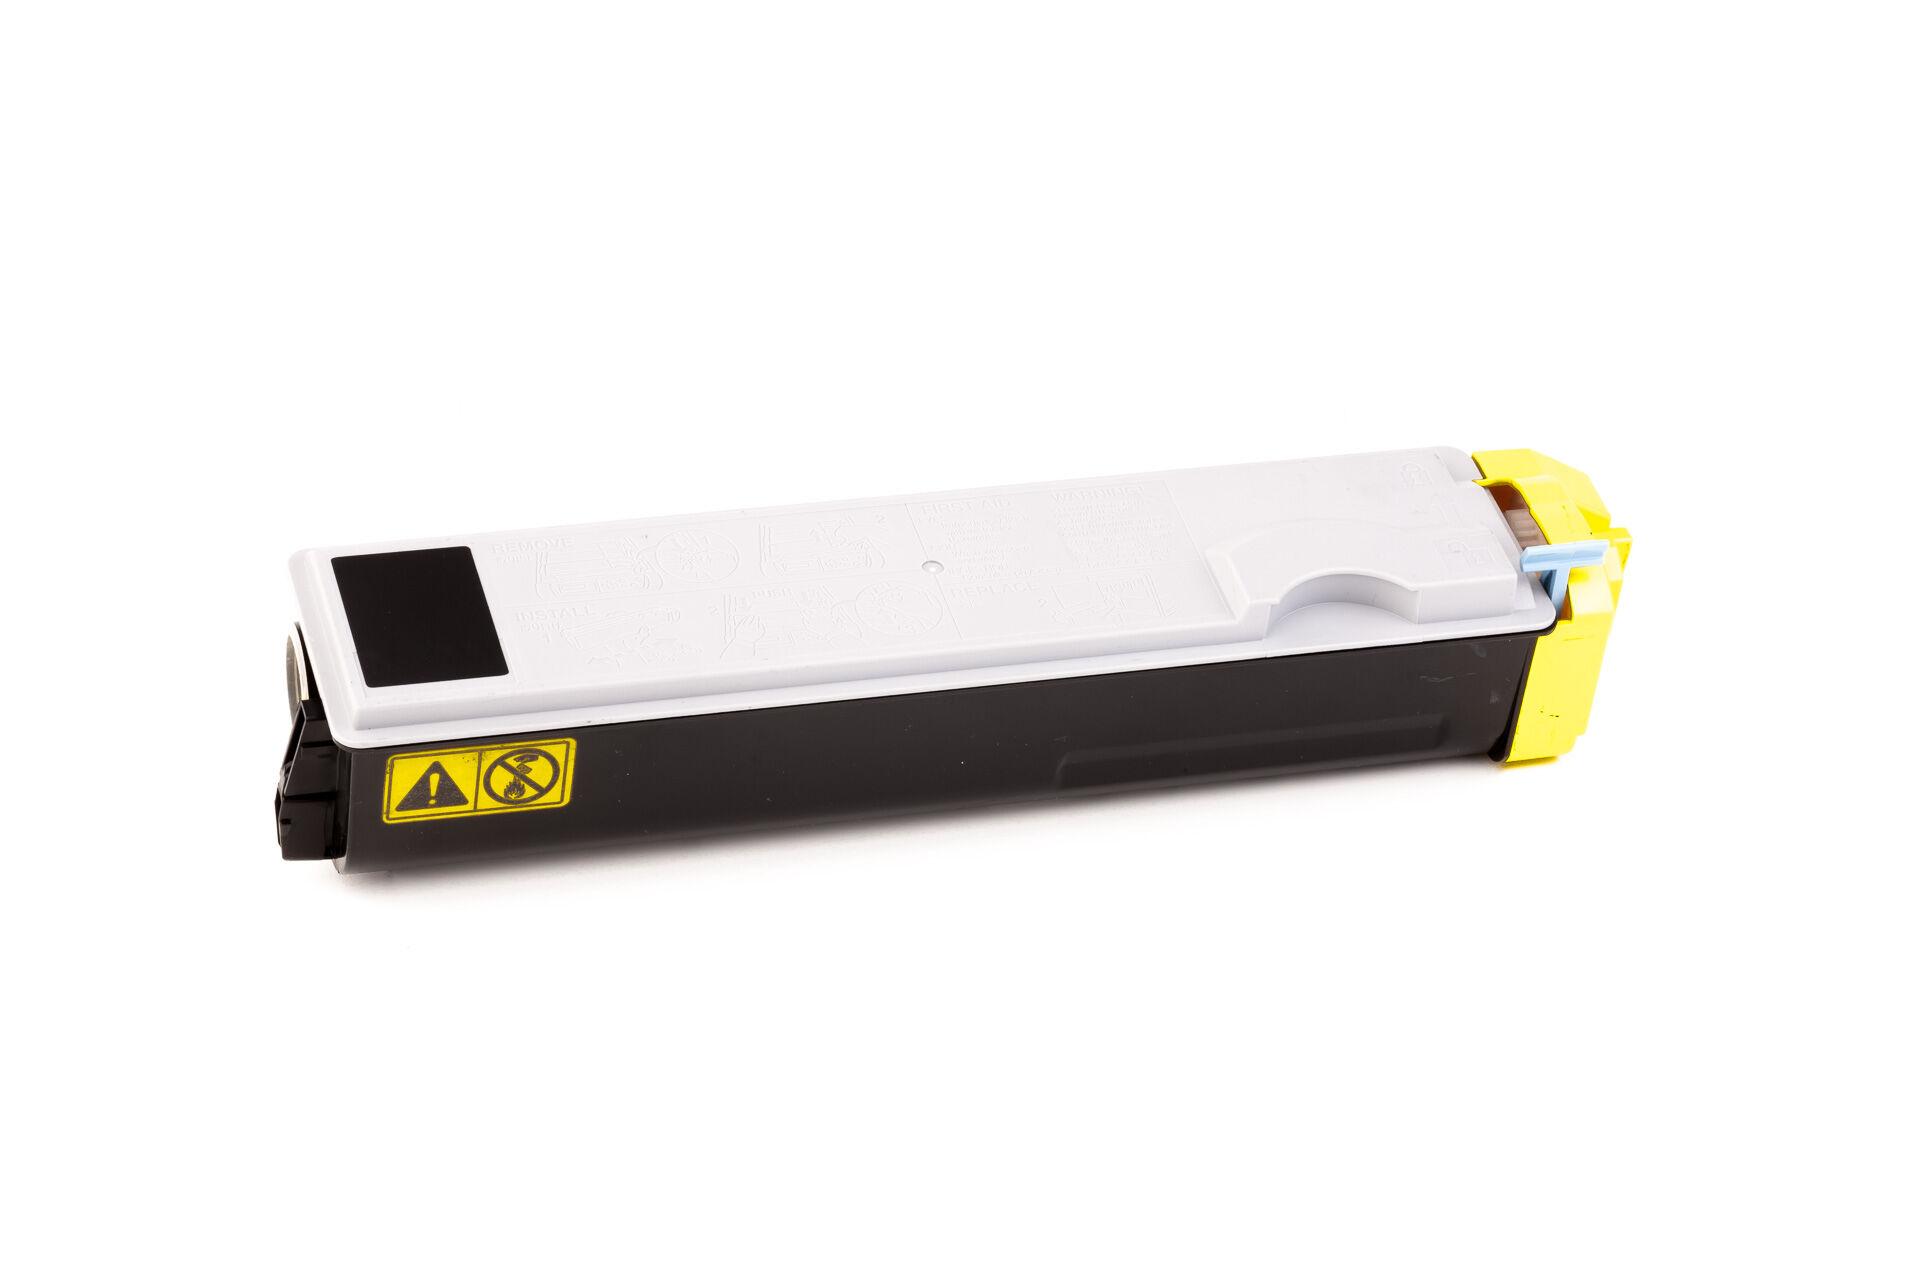 Kyocera Cartouche de Toner pour Kyocera 1T02HJBEU0 / TK-520 M magenta compatible (de marque ASC)